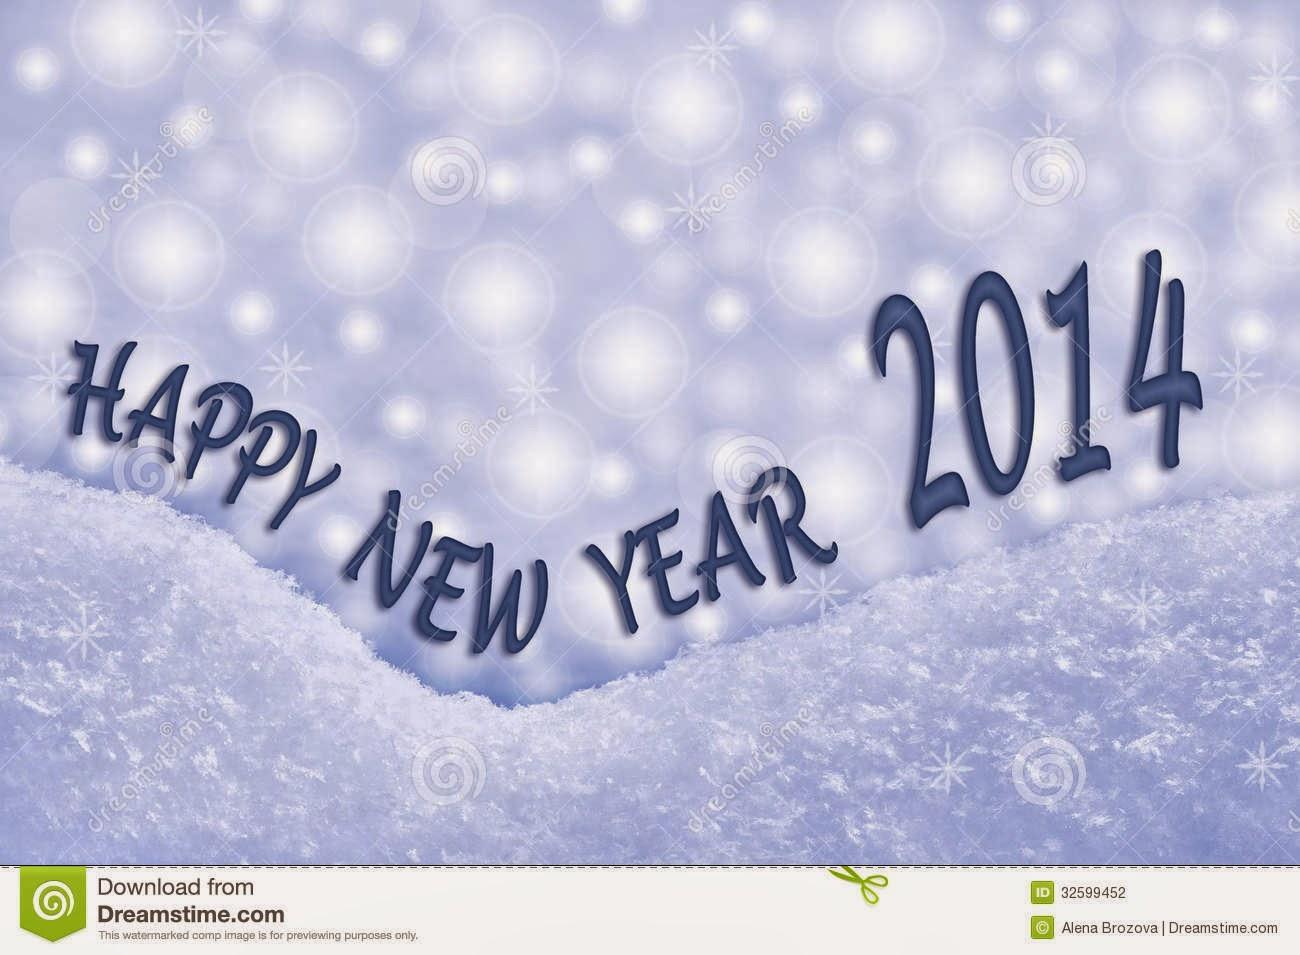 New Year 2014 Greetings eCards Free Download: November 2013